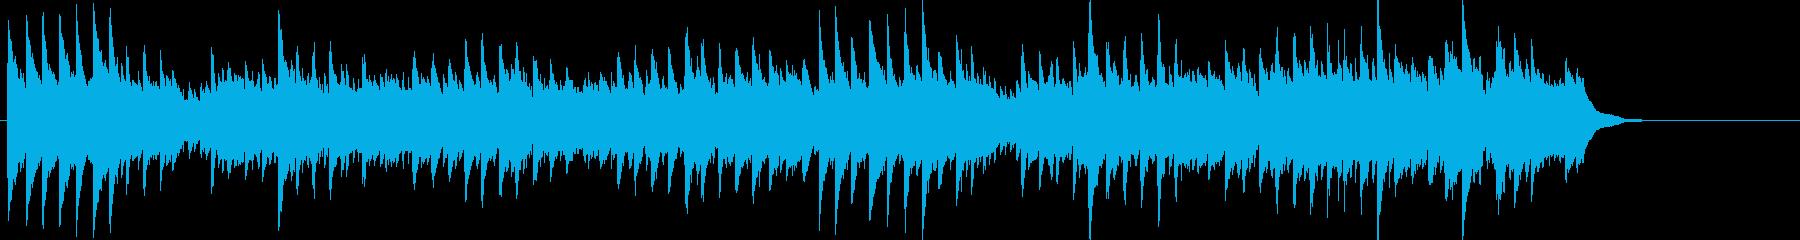 Dm三拍子のピアノソロの再生済みの波形